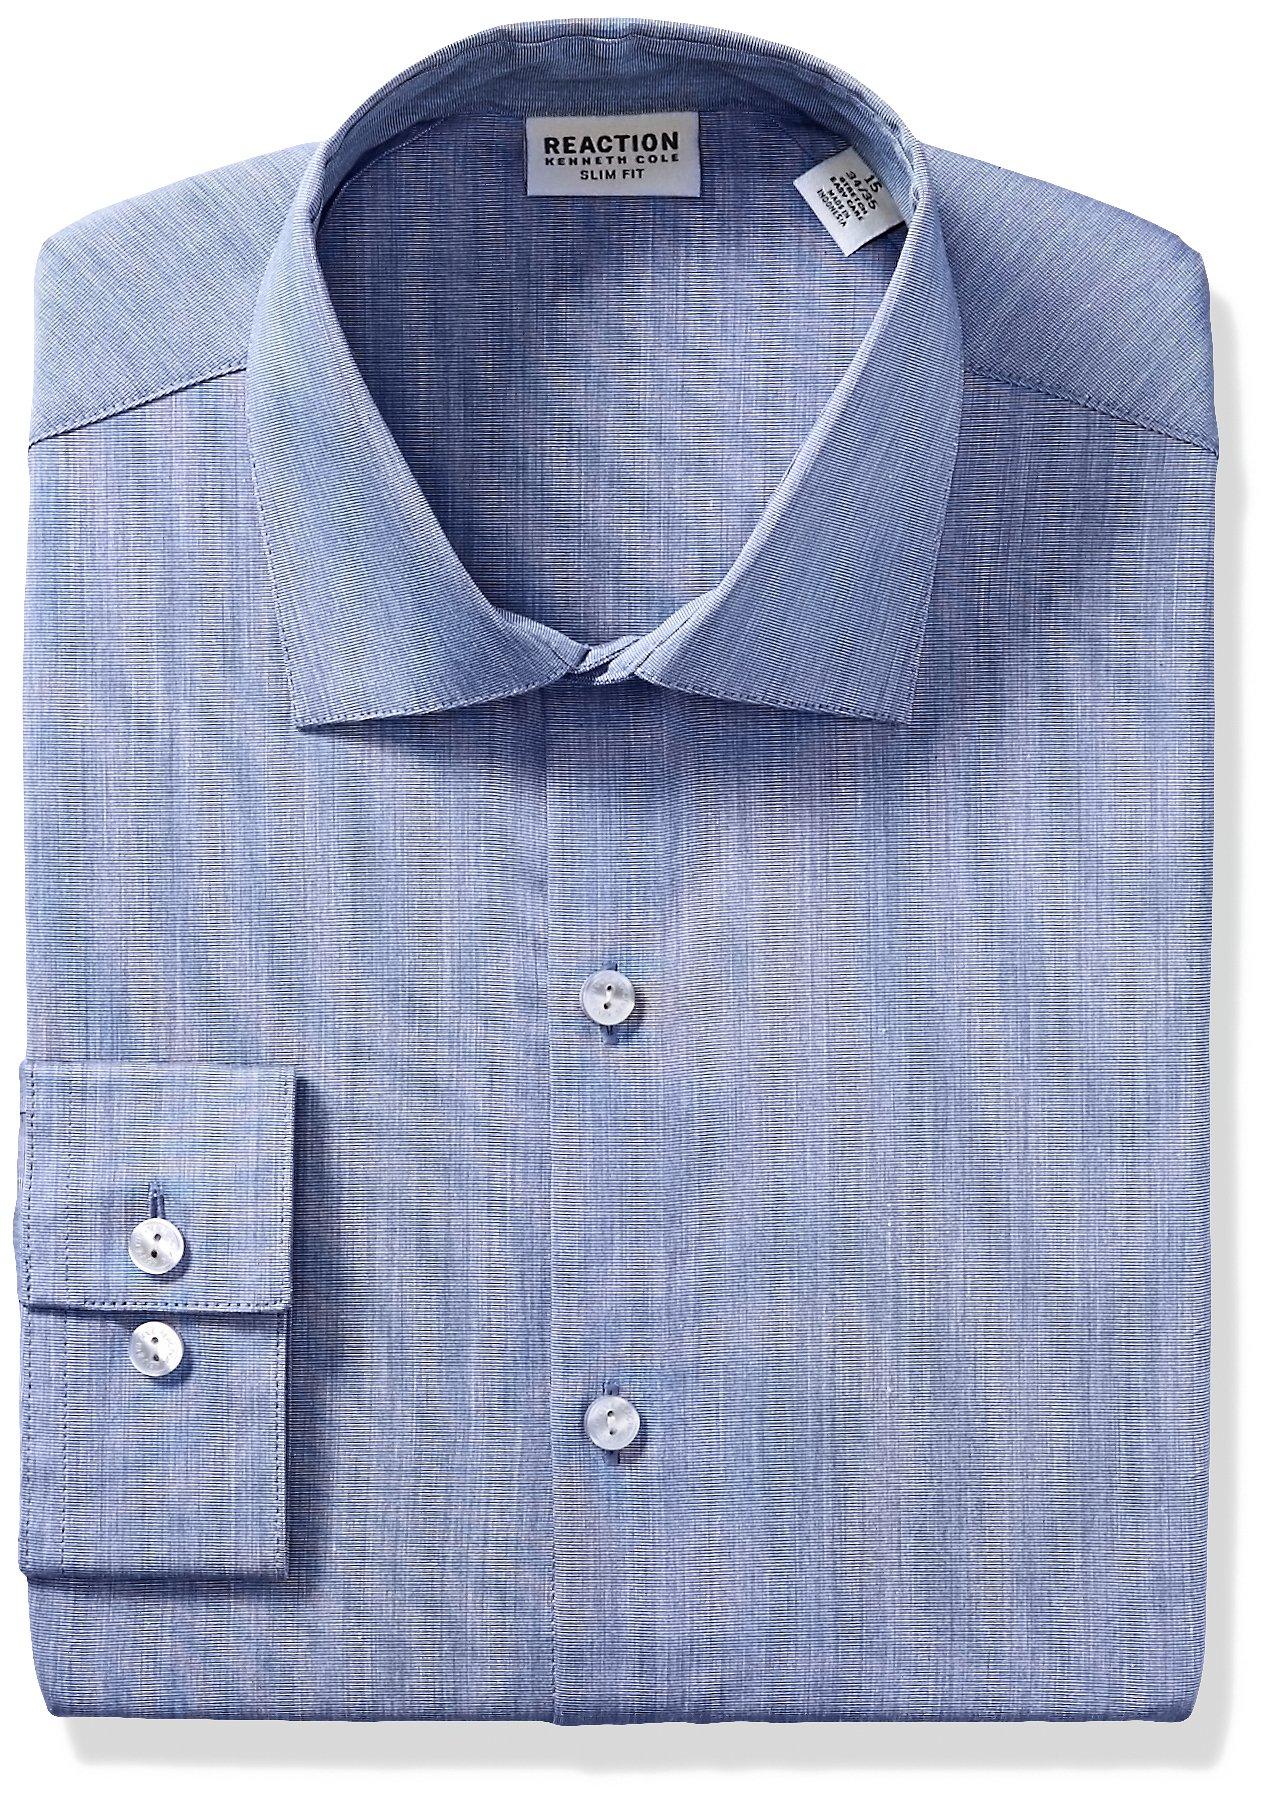 Kenneth Cole Reaction Men's Technicole Slim Fit Stretch Solid Spread Collar Dress Shirt , Indigo, 17'' Neck 34''-35'' Sleeve